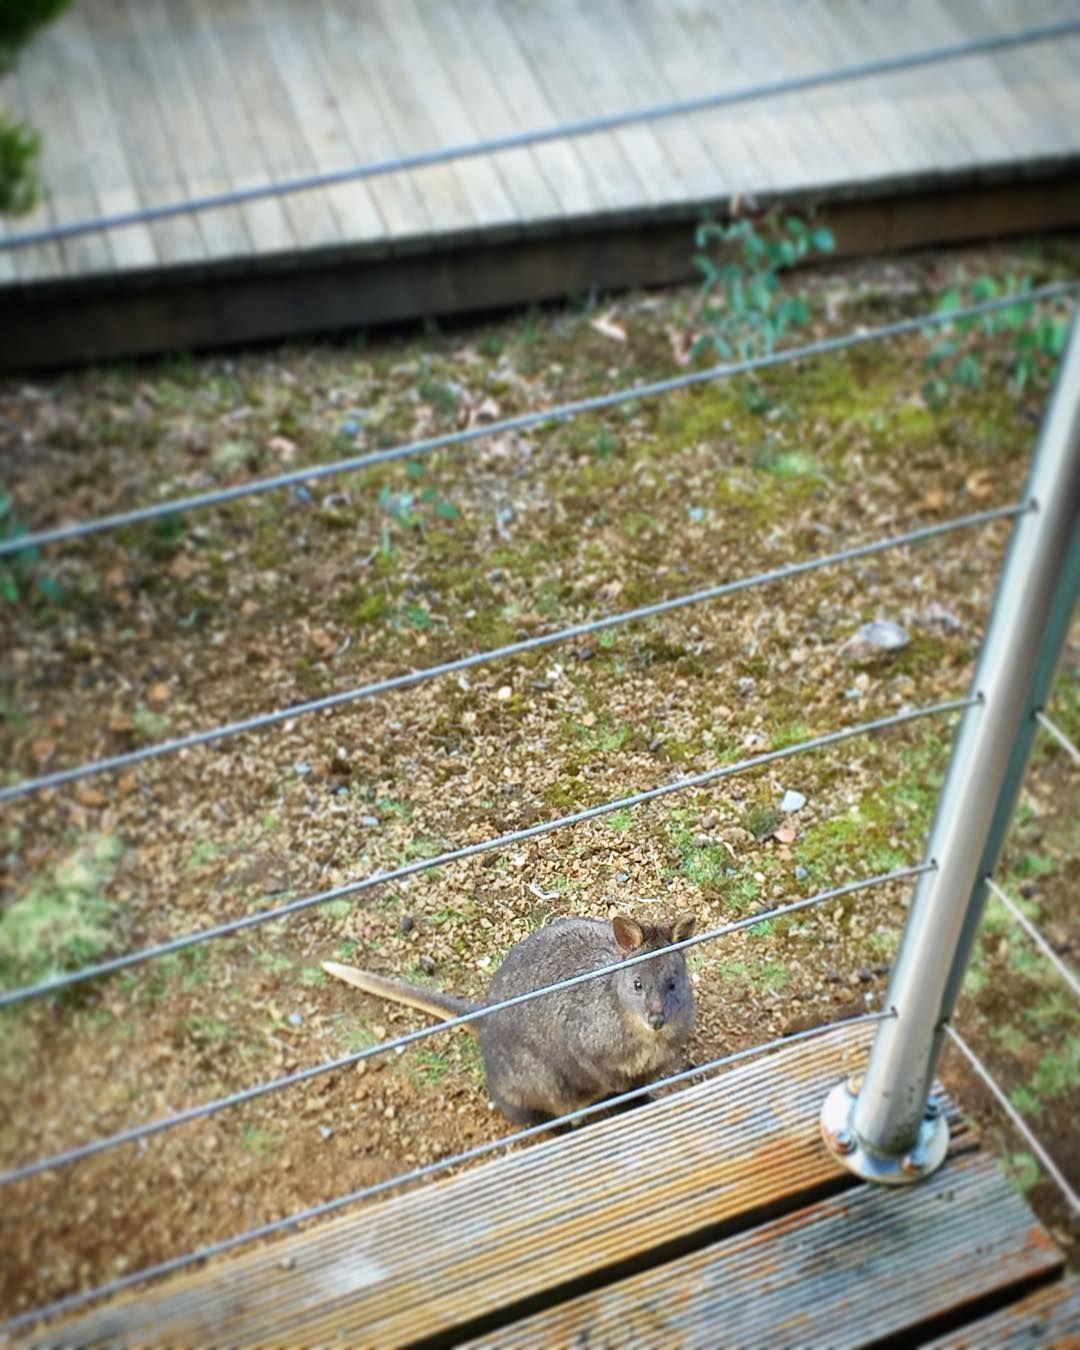 #Wallaby near balcony at #cradlemountain by dennistan84